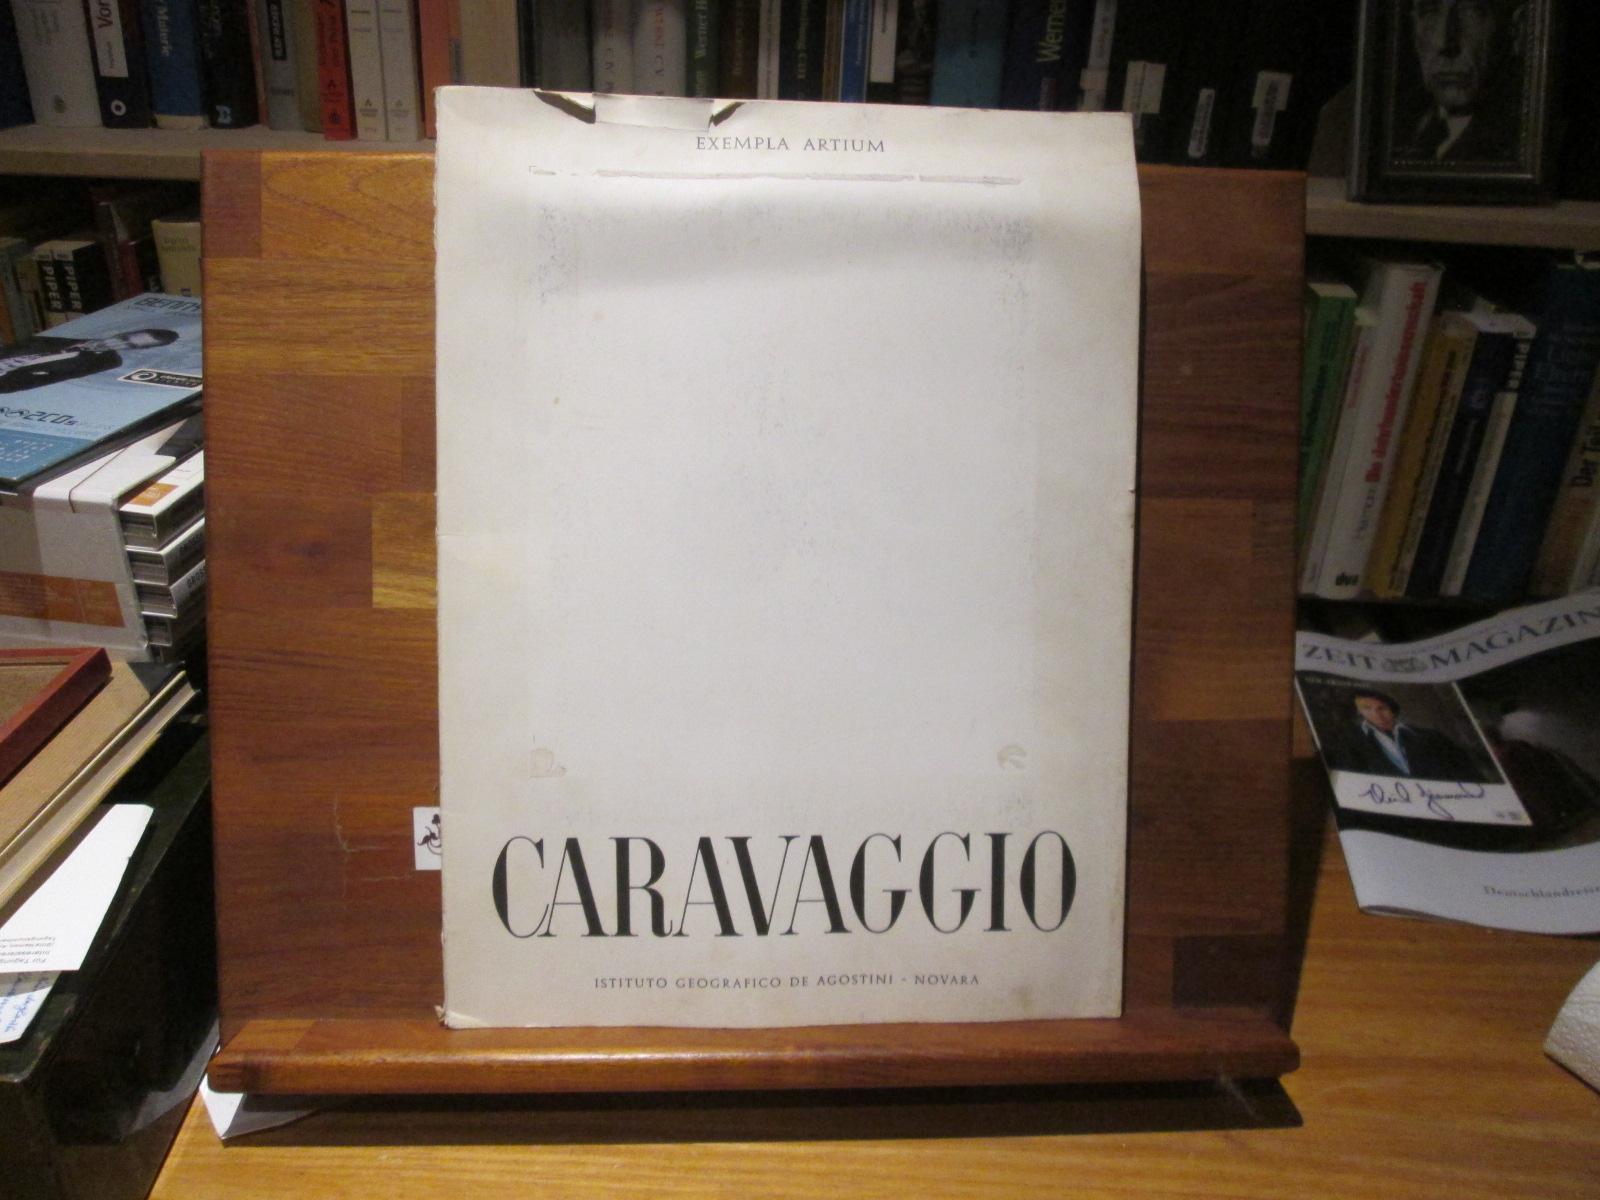 Caravaggio. Caravaggio. [Einl.:] Carlo Basso / Exempla artium